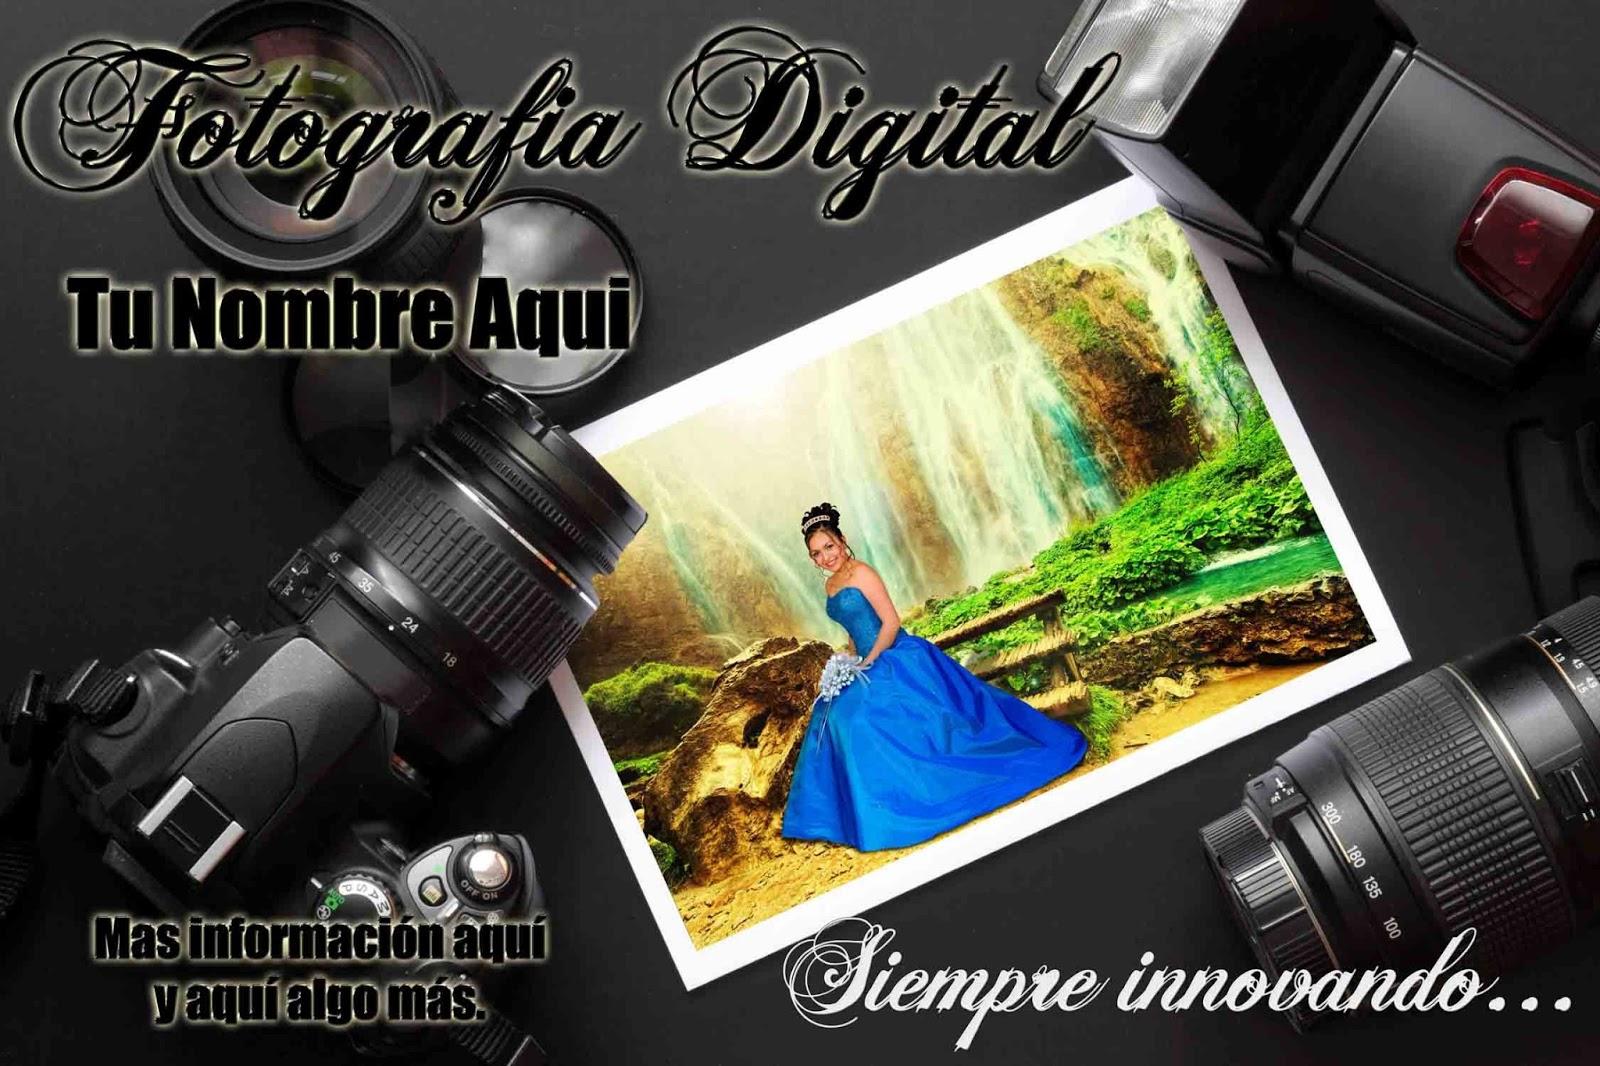 Lona+psd+para+fotografia+digital.jpg